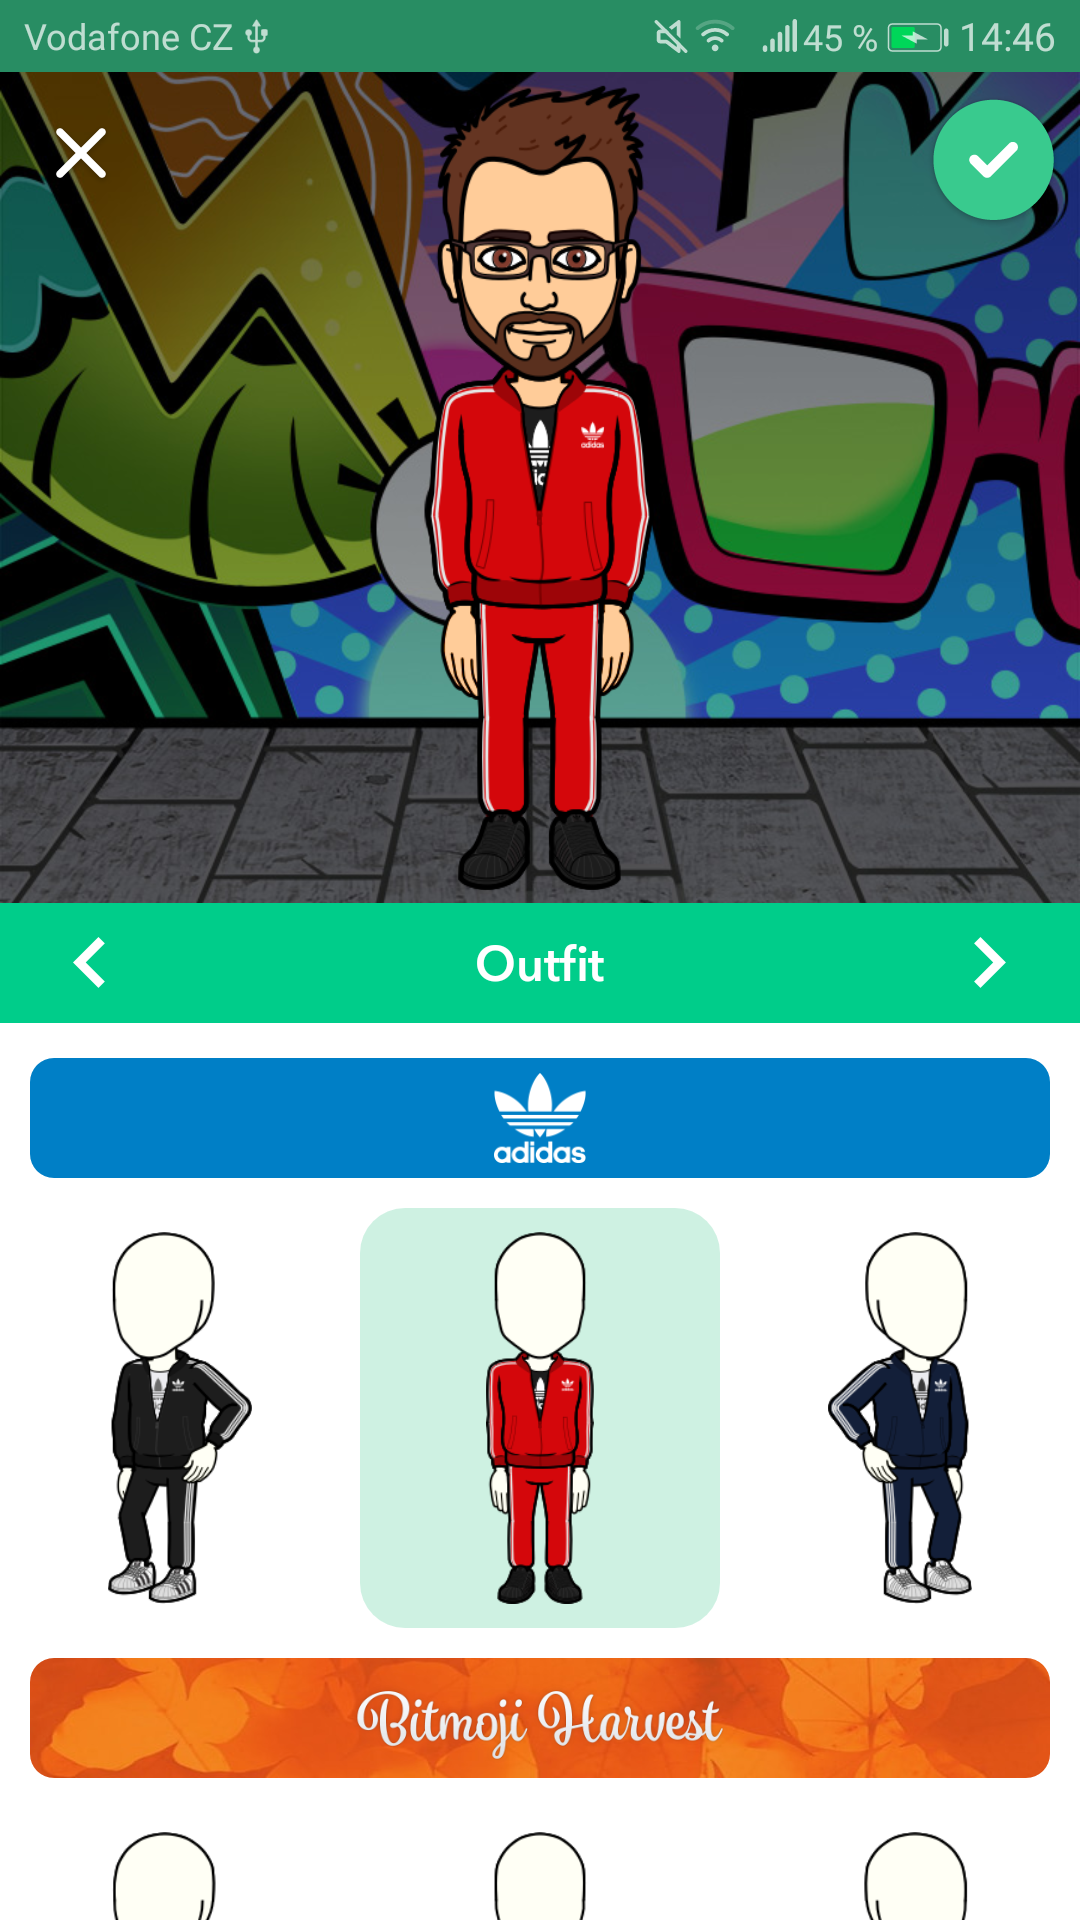 Bitmoji outfit 2